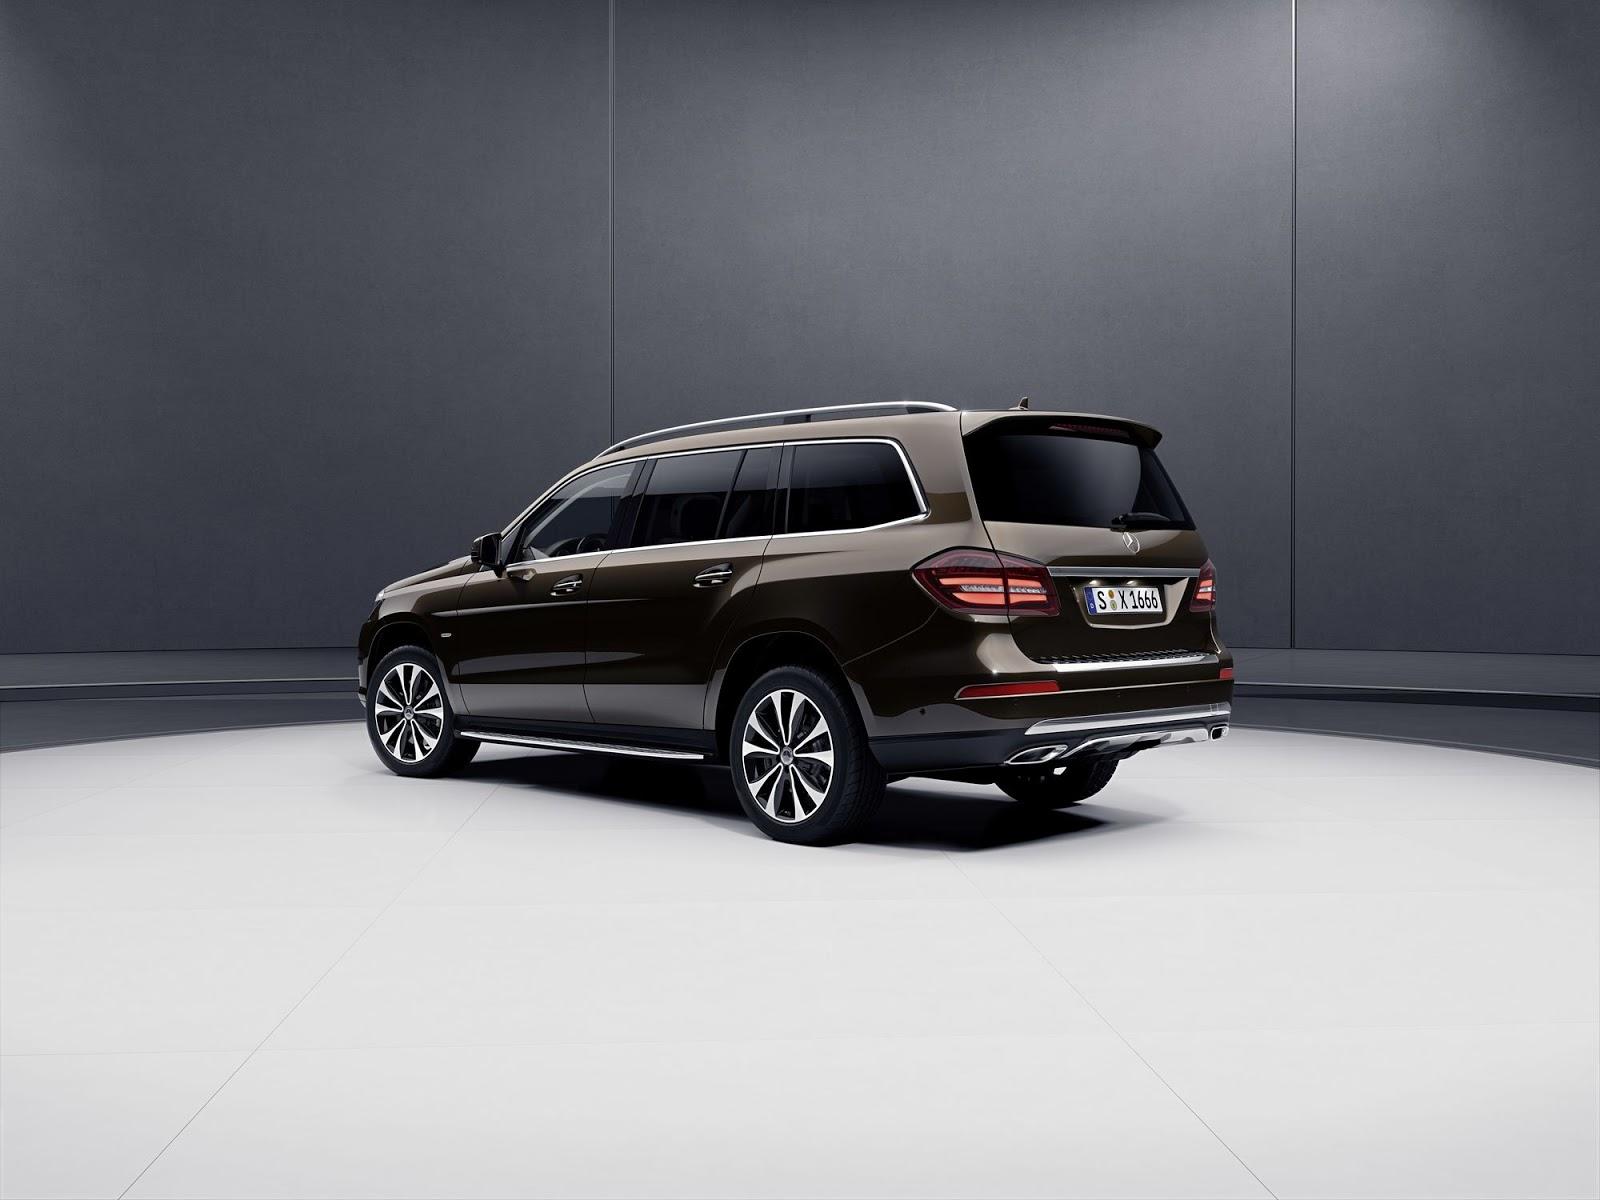 Mercedes представил версию Grand Edition Мерседес-Бенс GLS